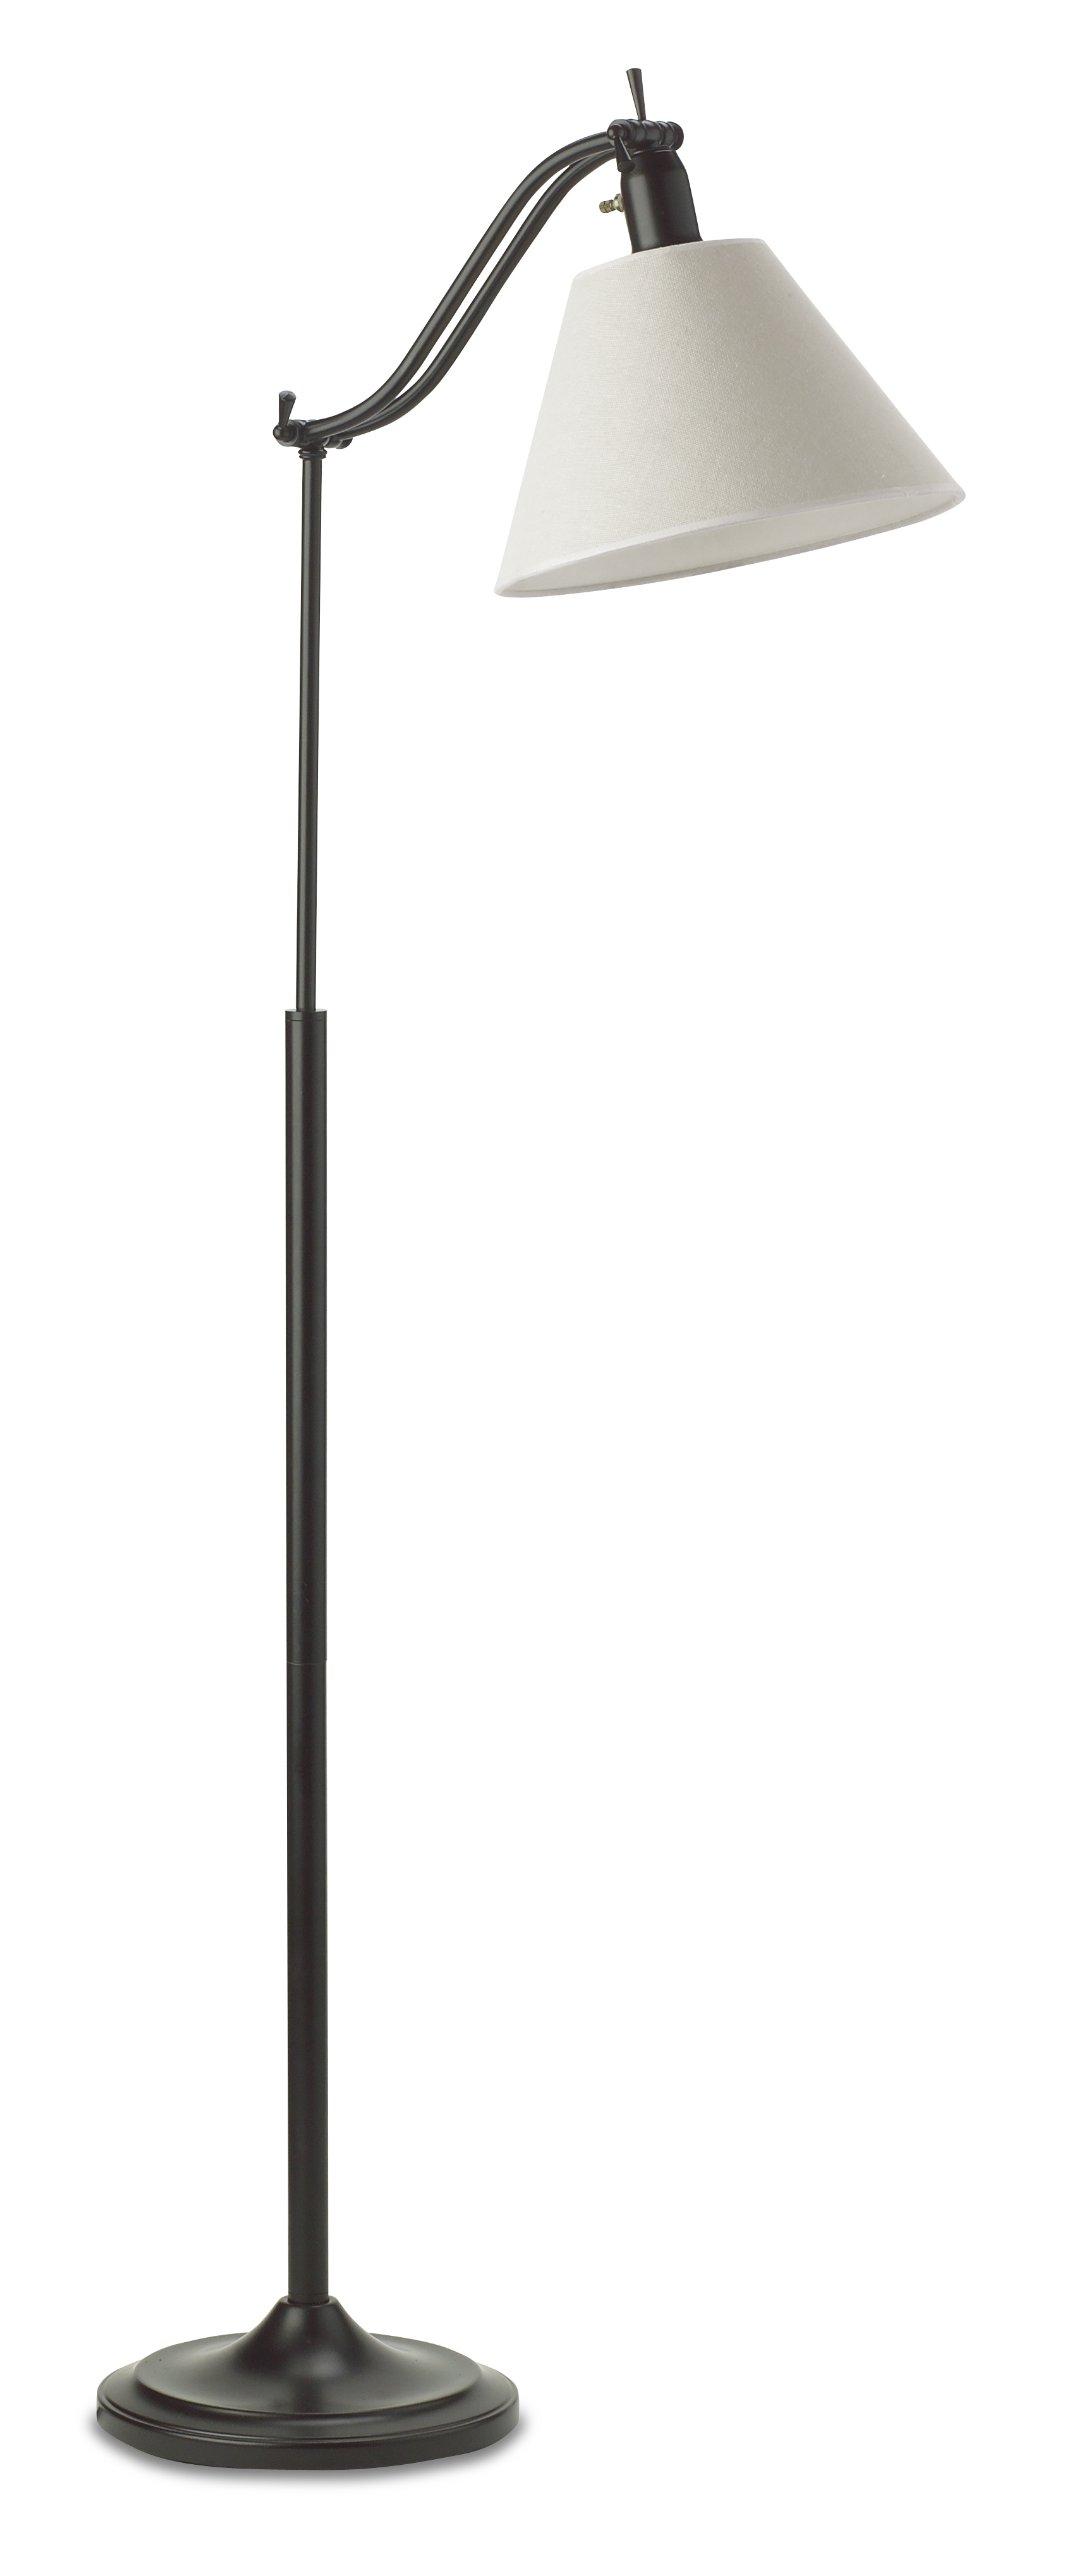 OttLite 20M15BZD-SHPR 20-watt Marietta Floor Lamp, Antiqued Bronze